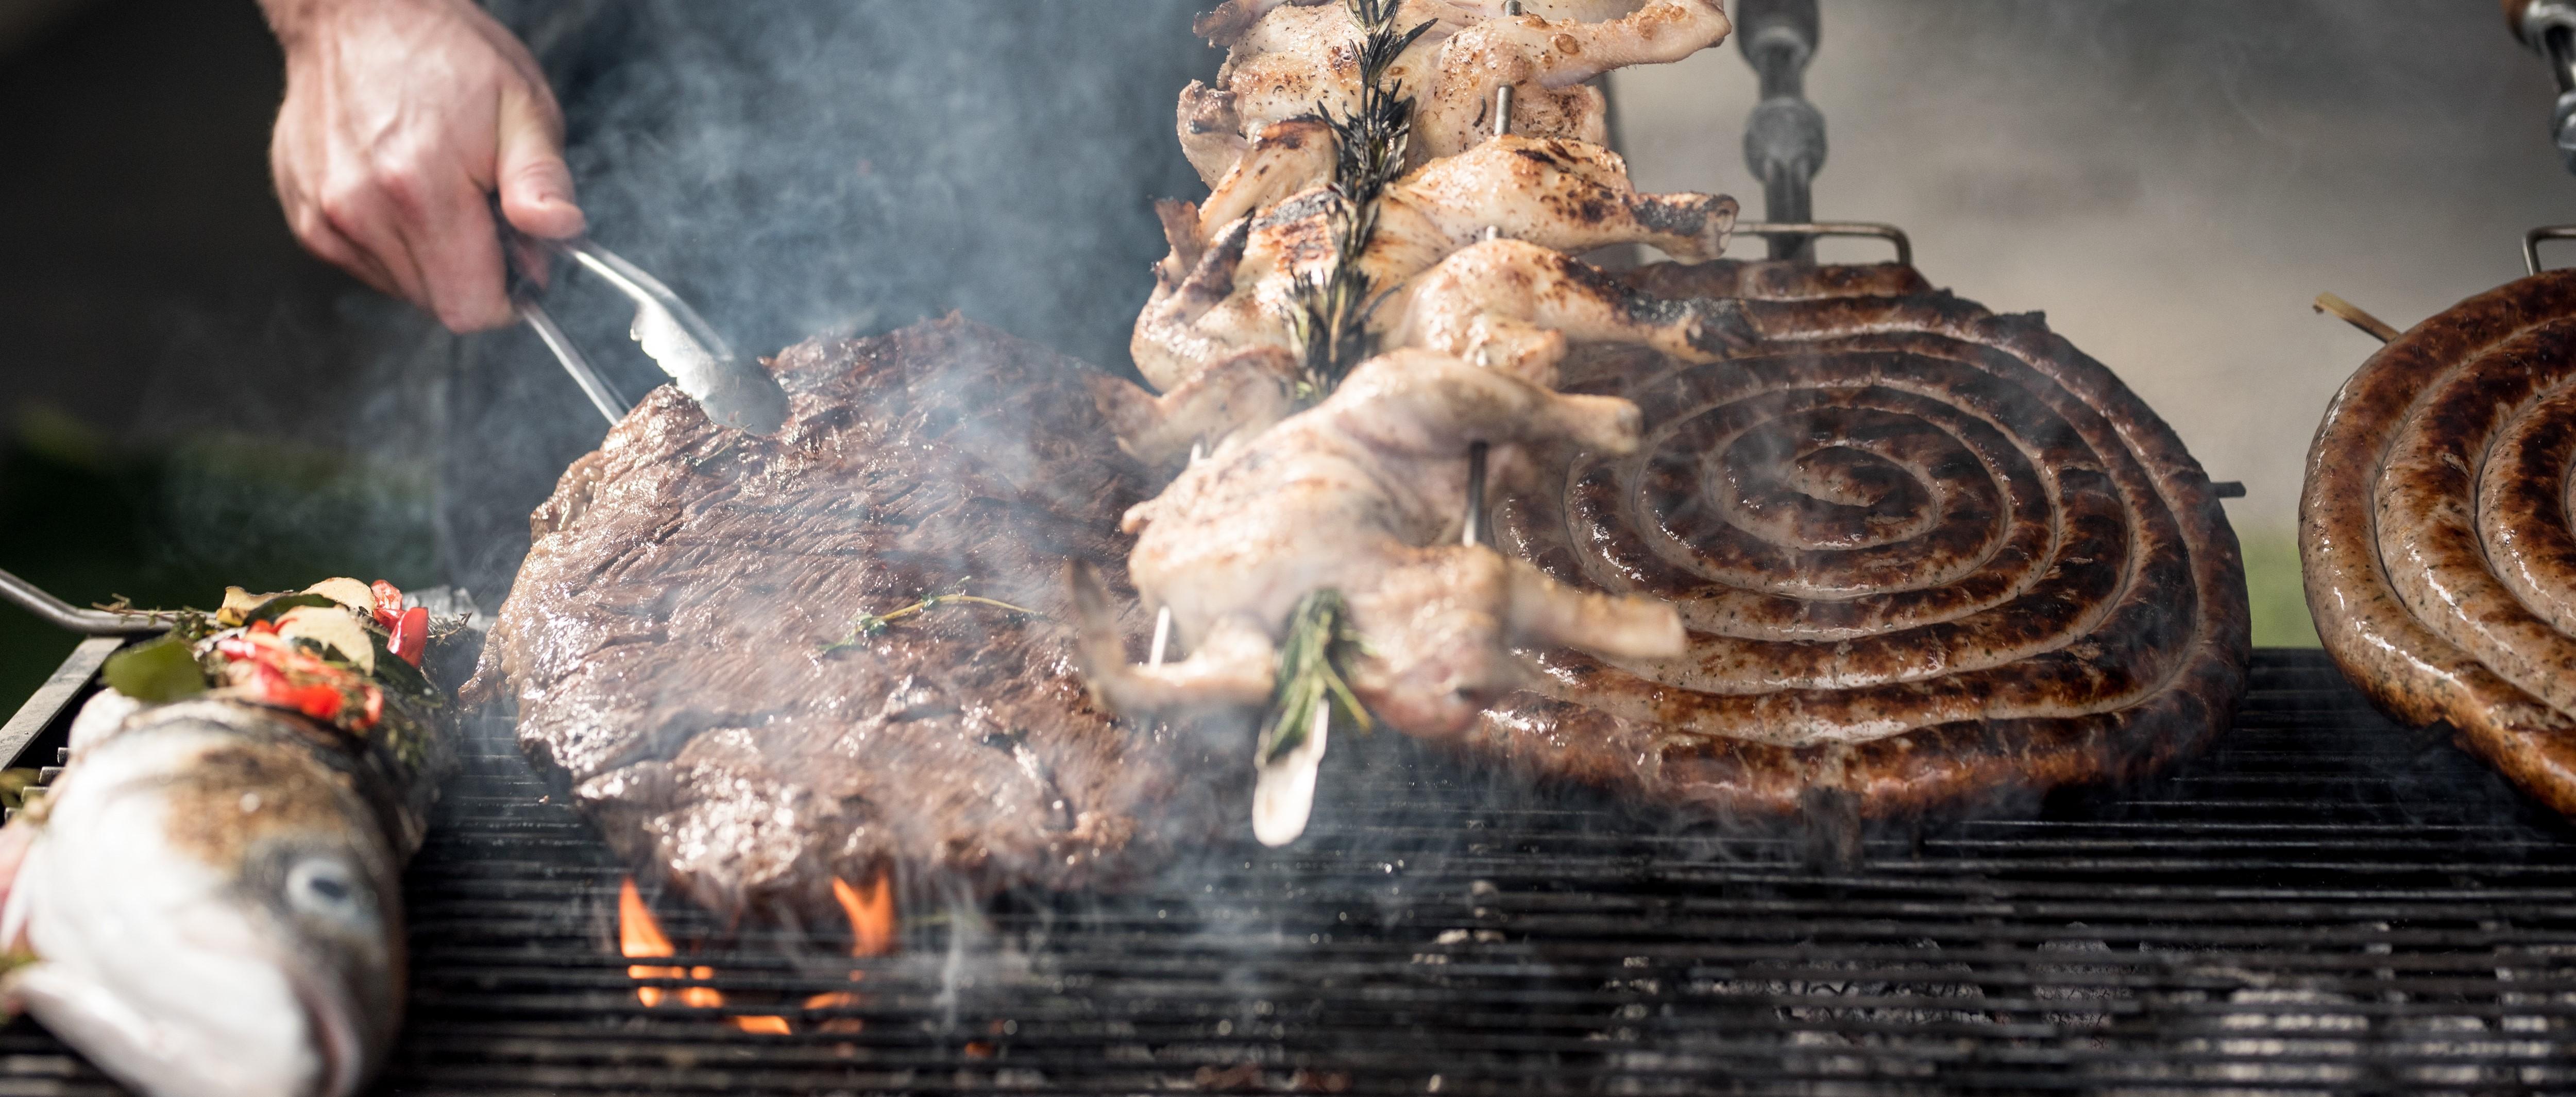 Churrasco Brazillian BBQ